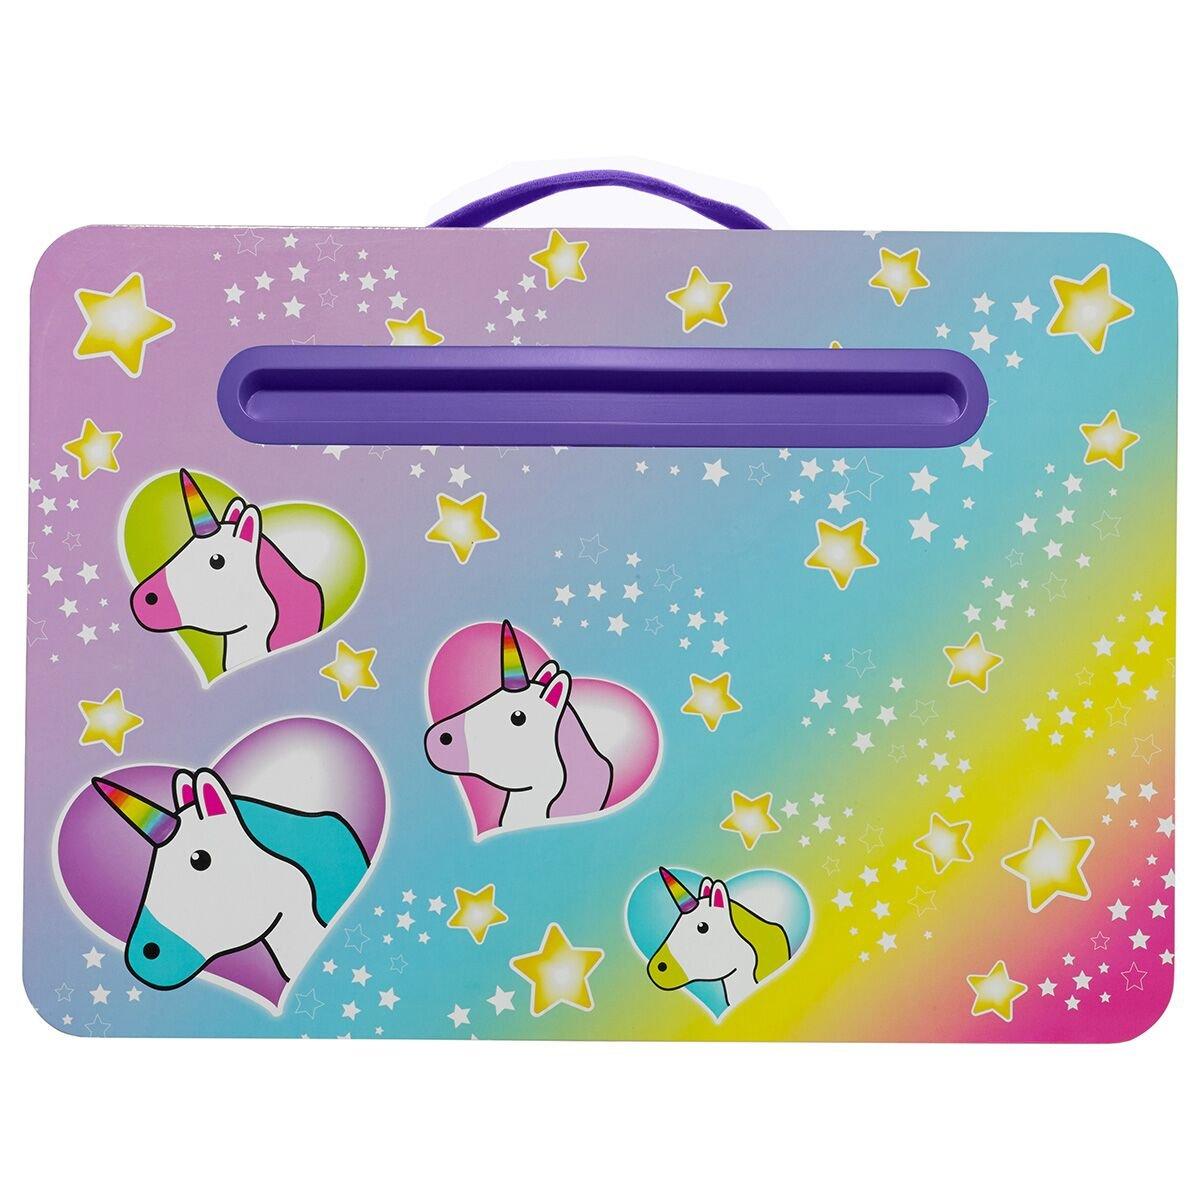 3C4G Unicorn Media Lap Desk (35983)